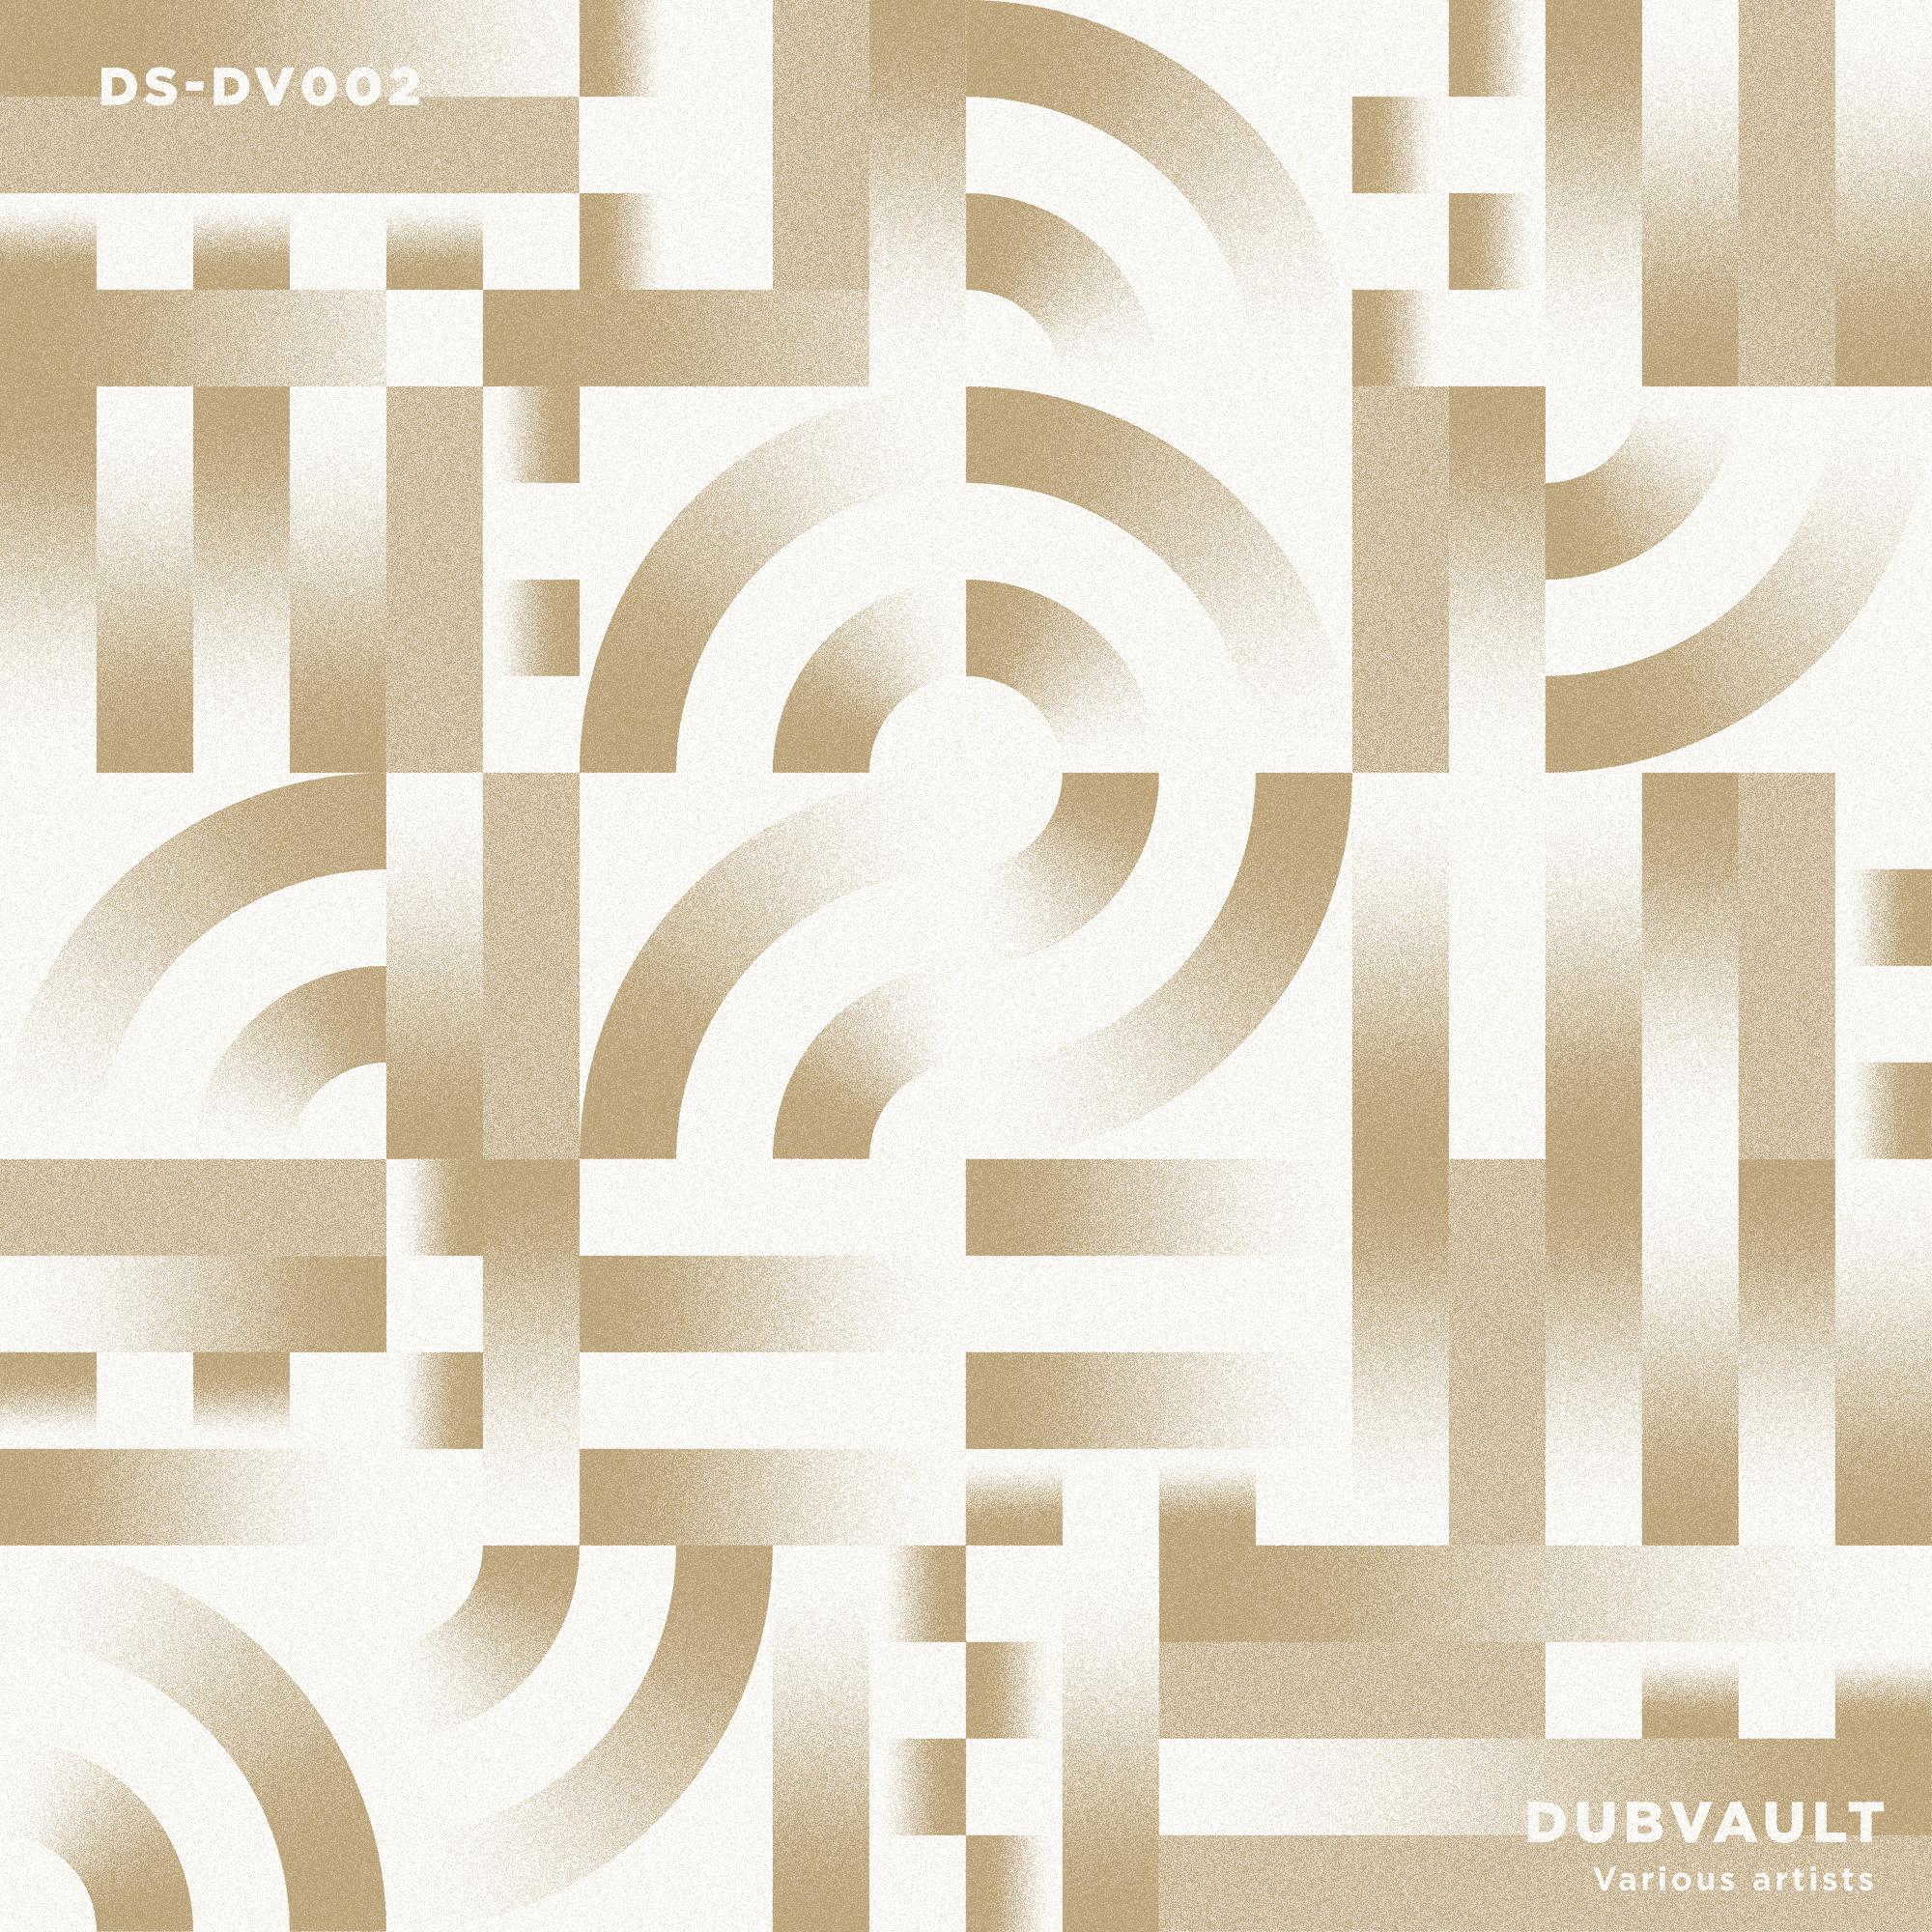 Dubvault Volume 2